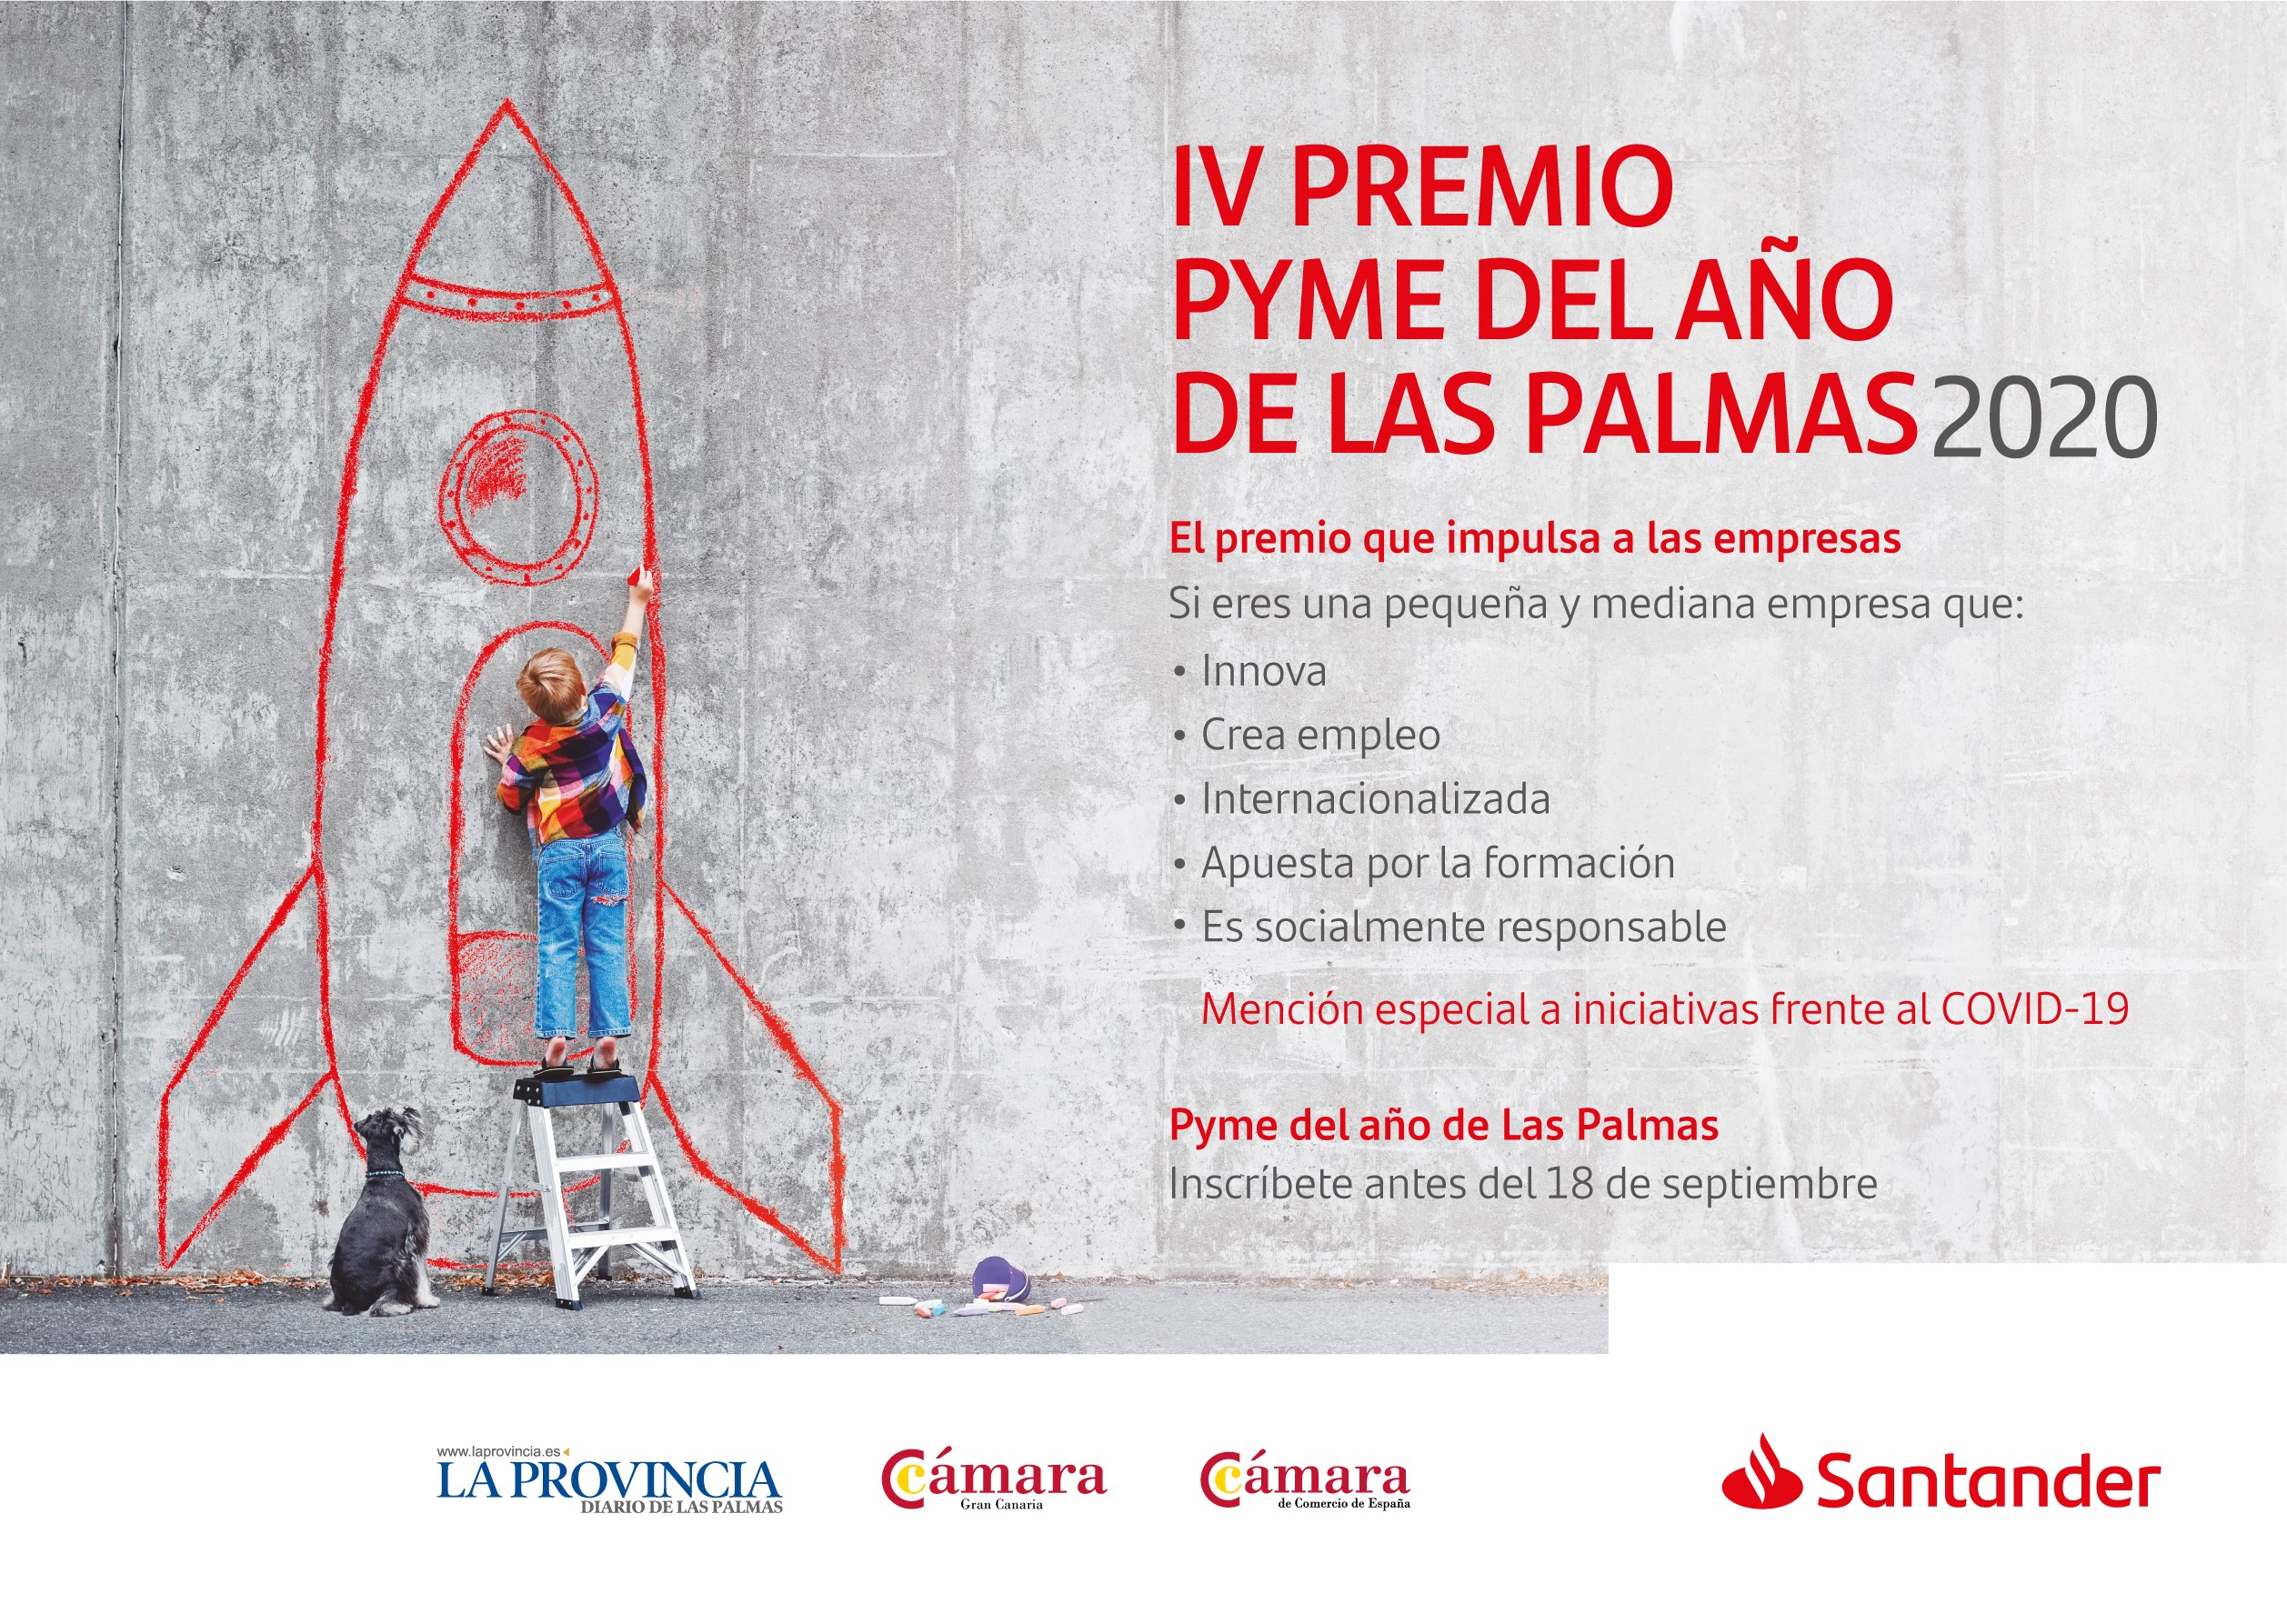 IV_premio_pyme_Las_Palmas_2020